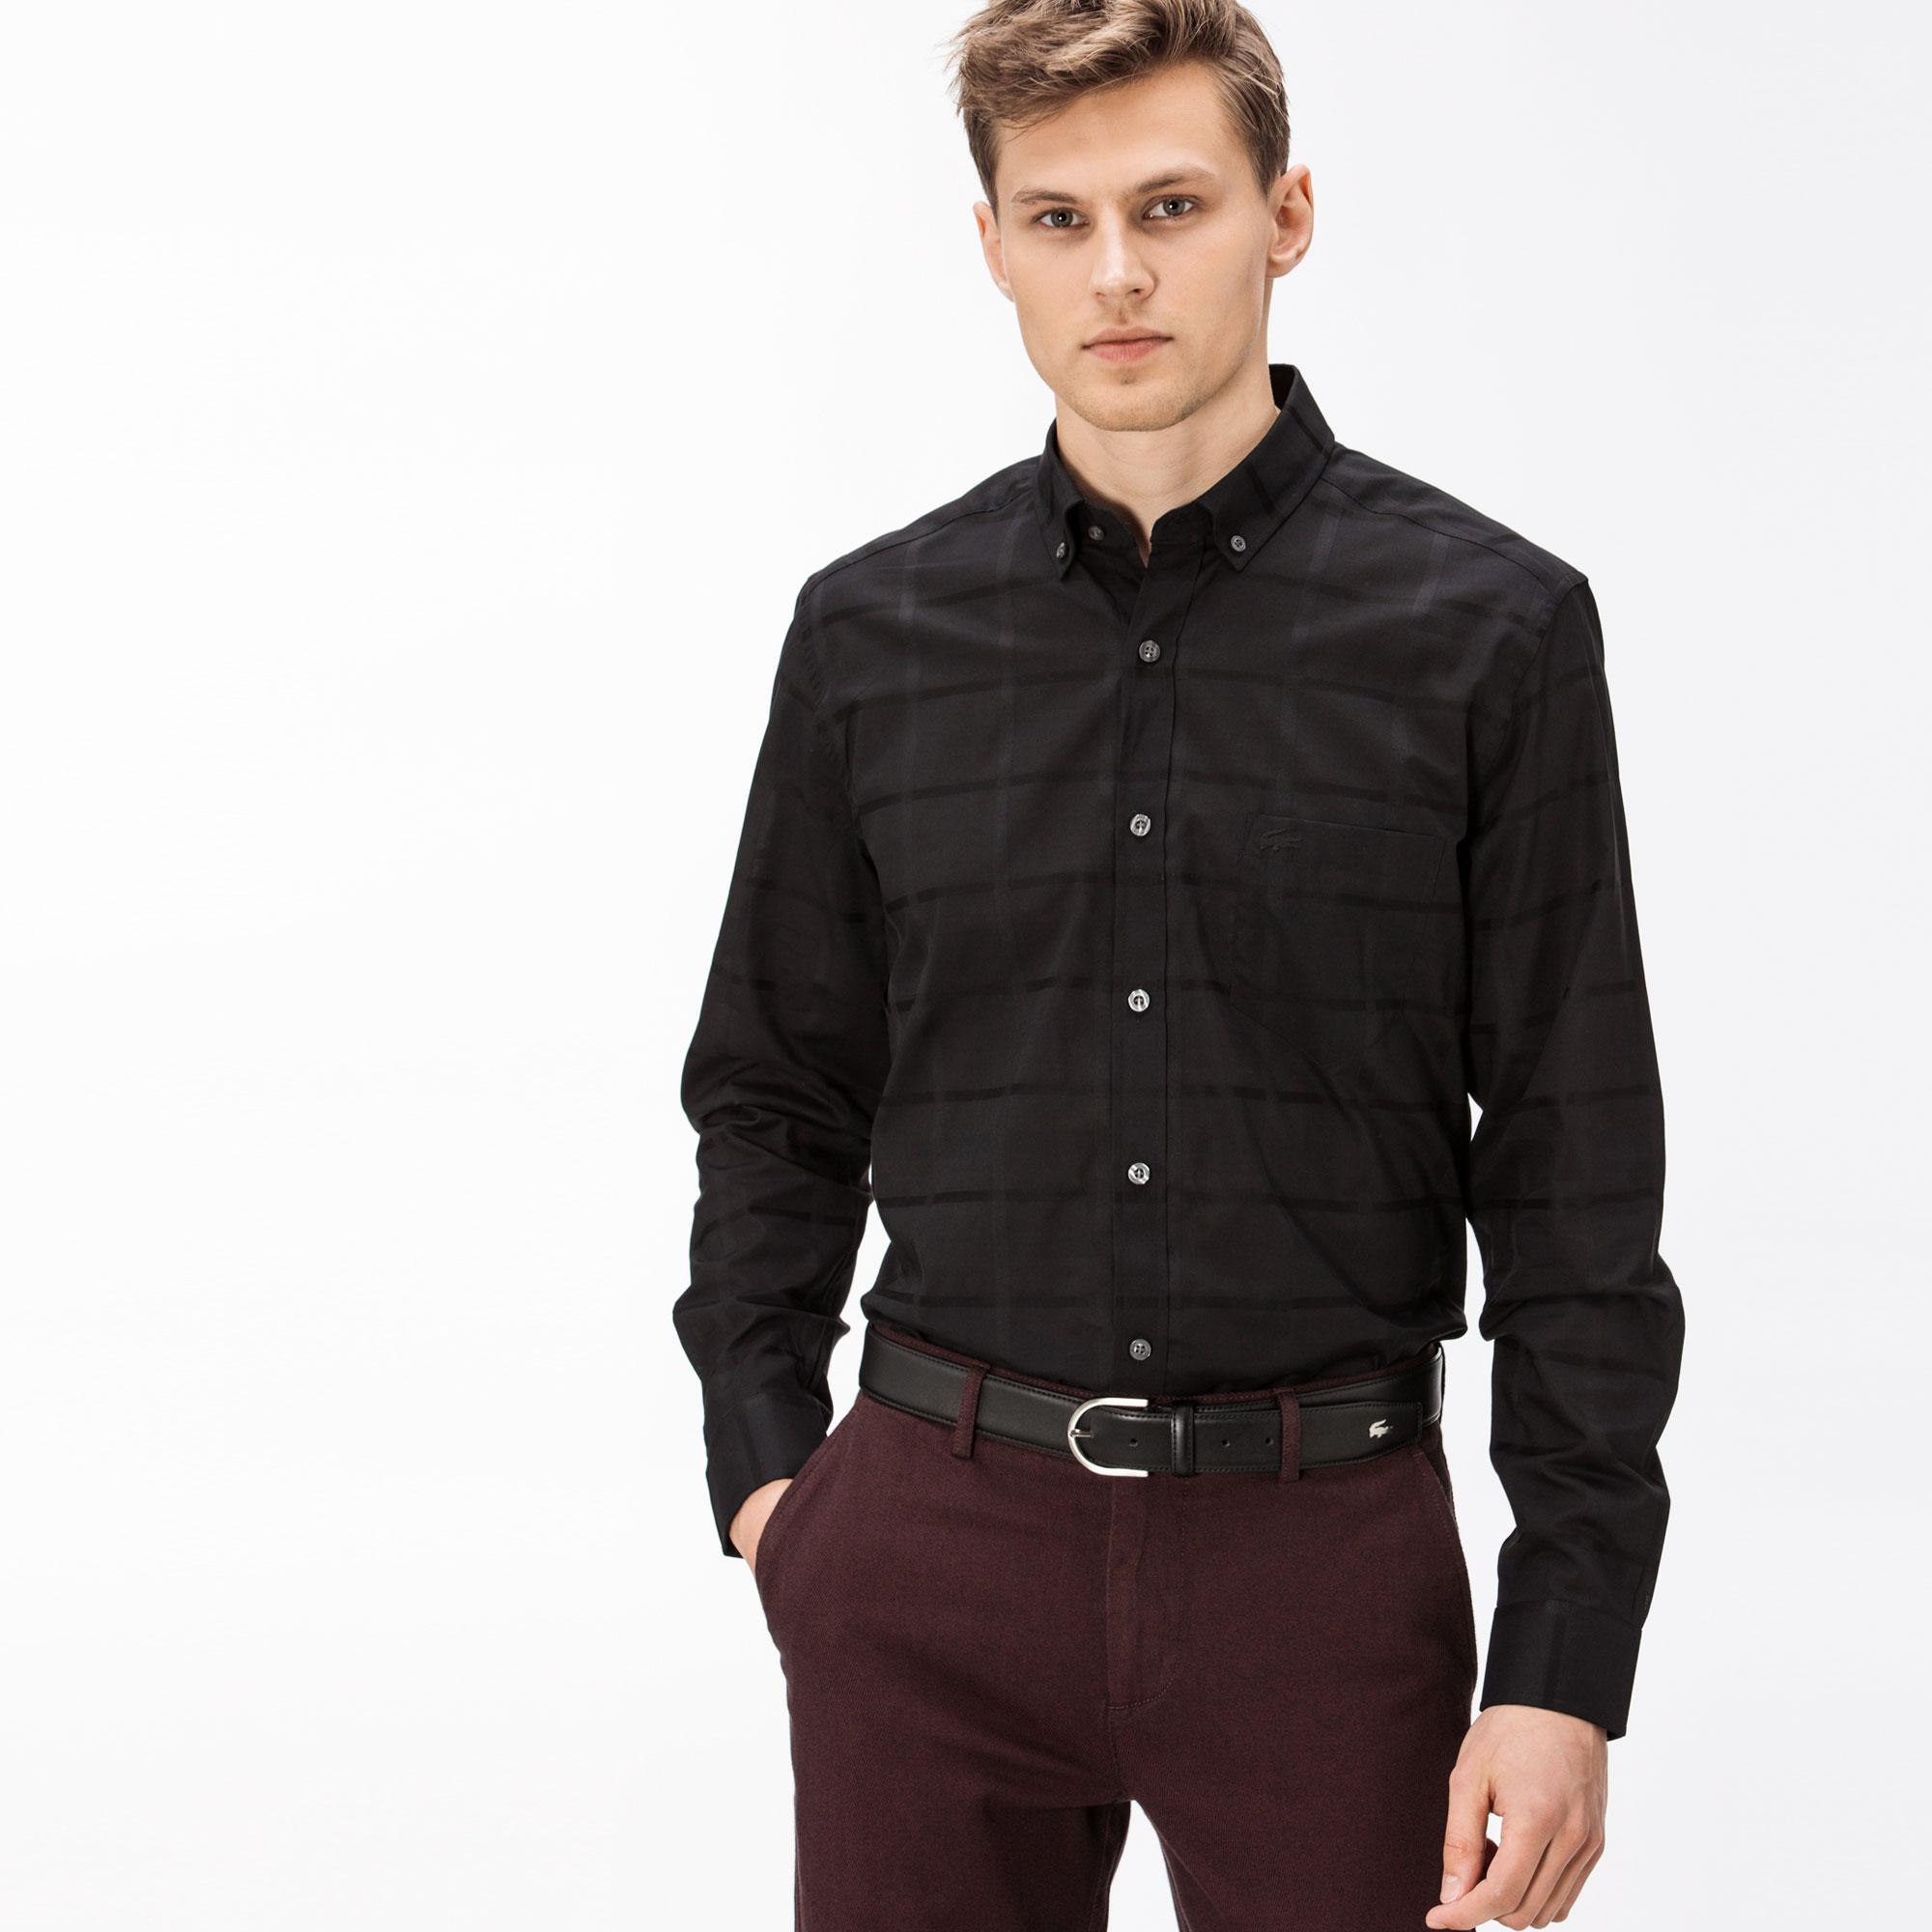 Lacoste Erkek Regular Fit Siyah Ekose Gömlek